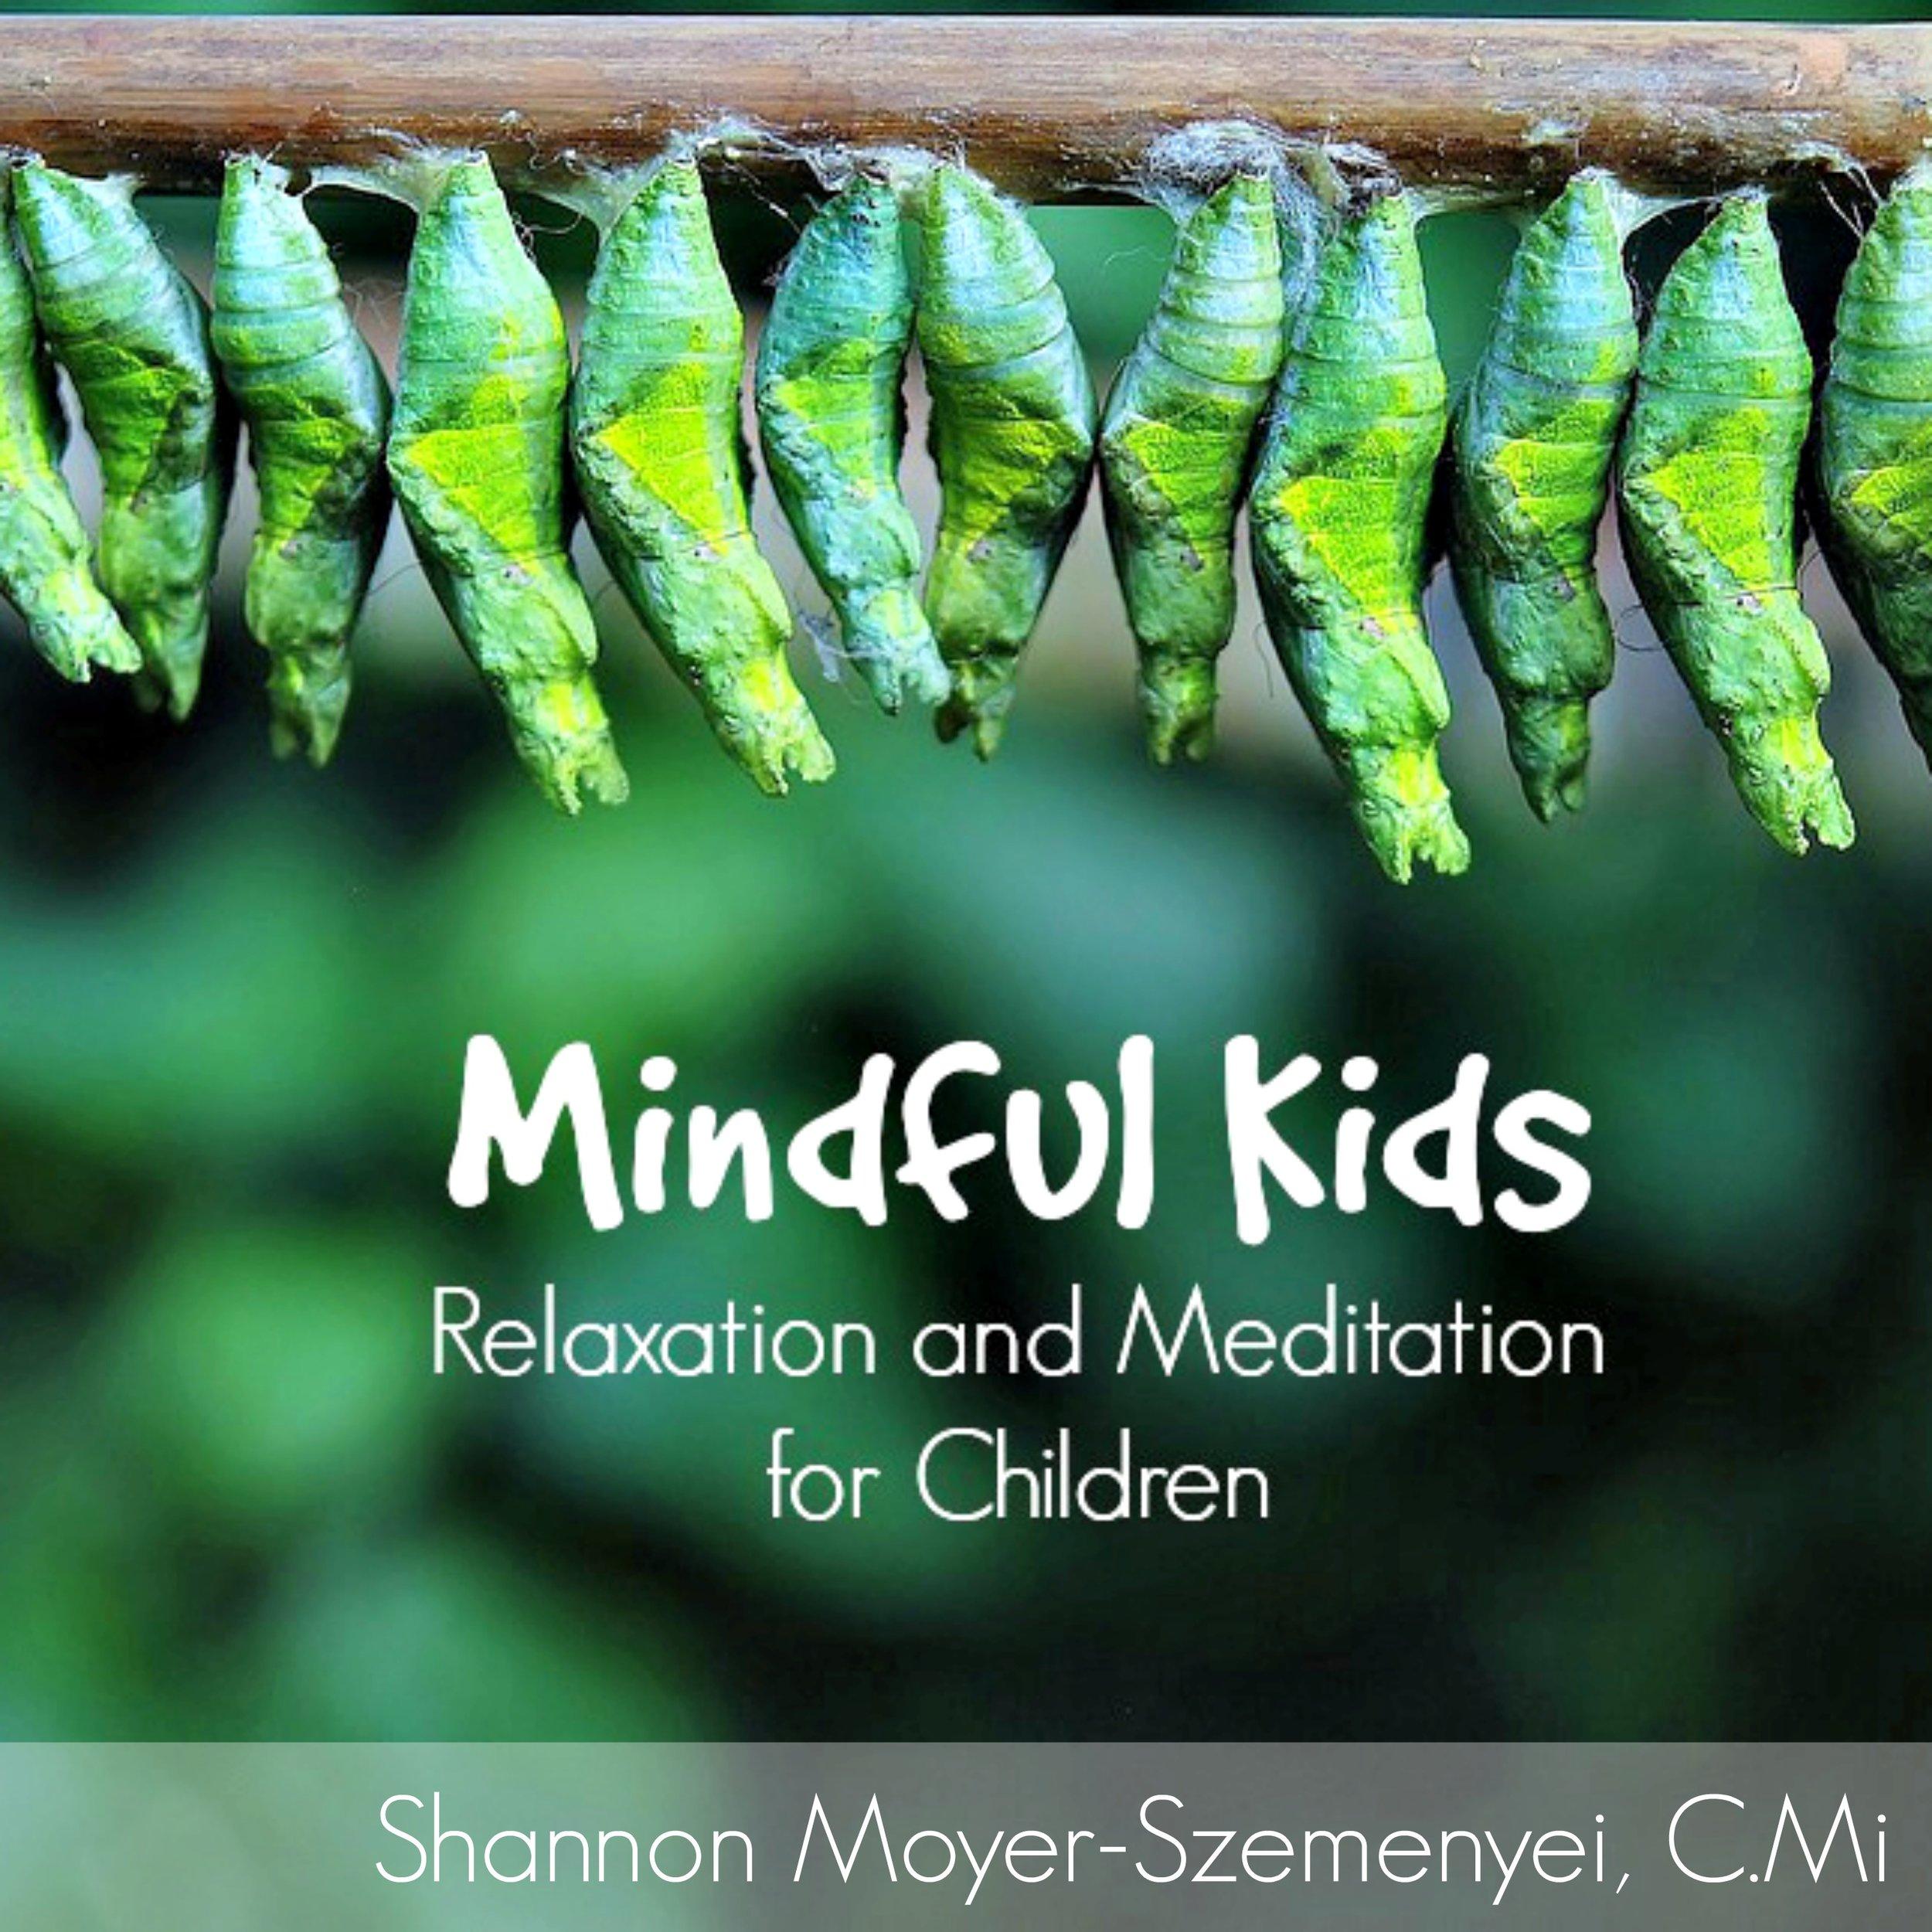 Mindful Kids | Sweet Stella's